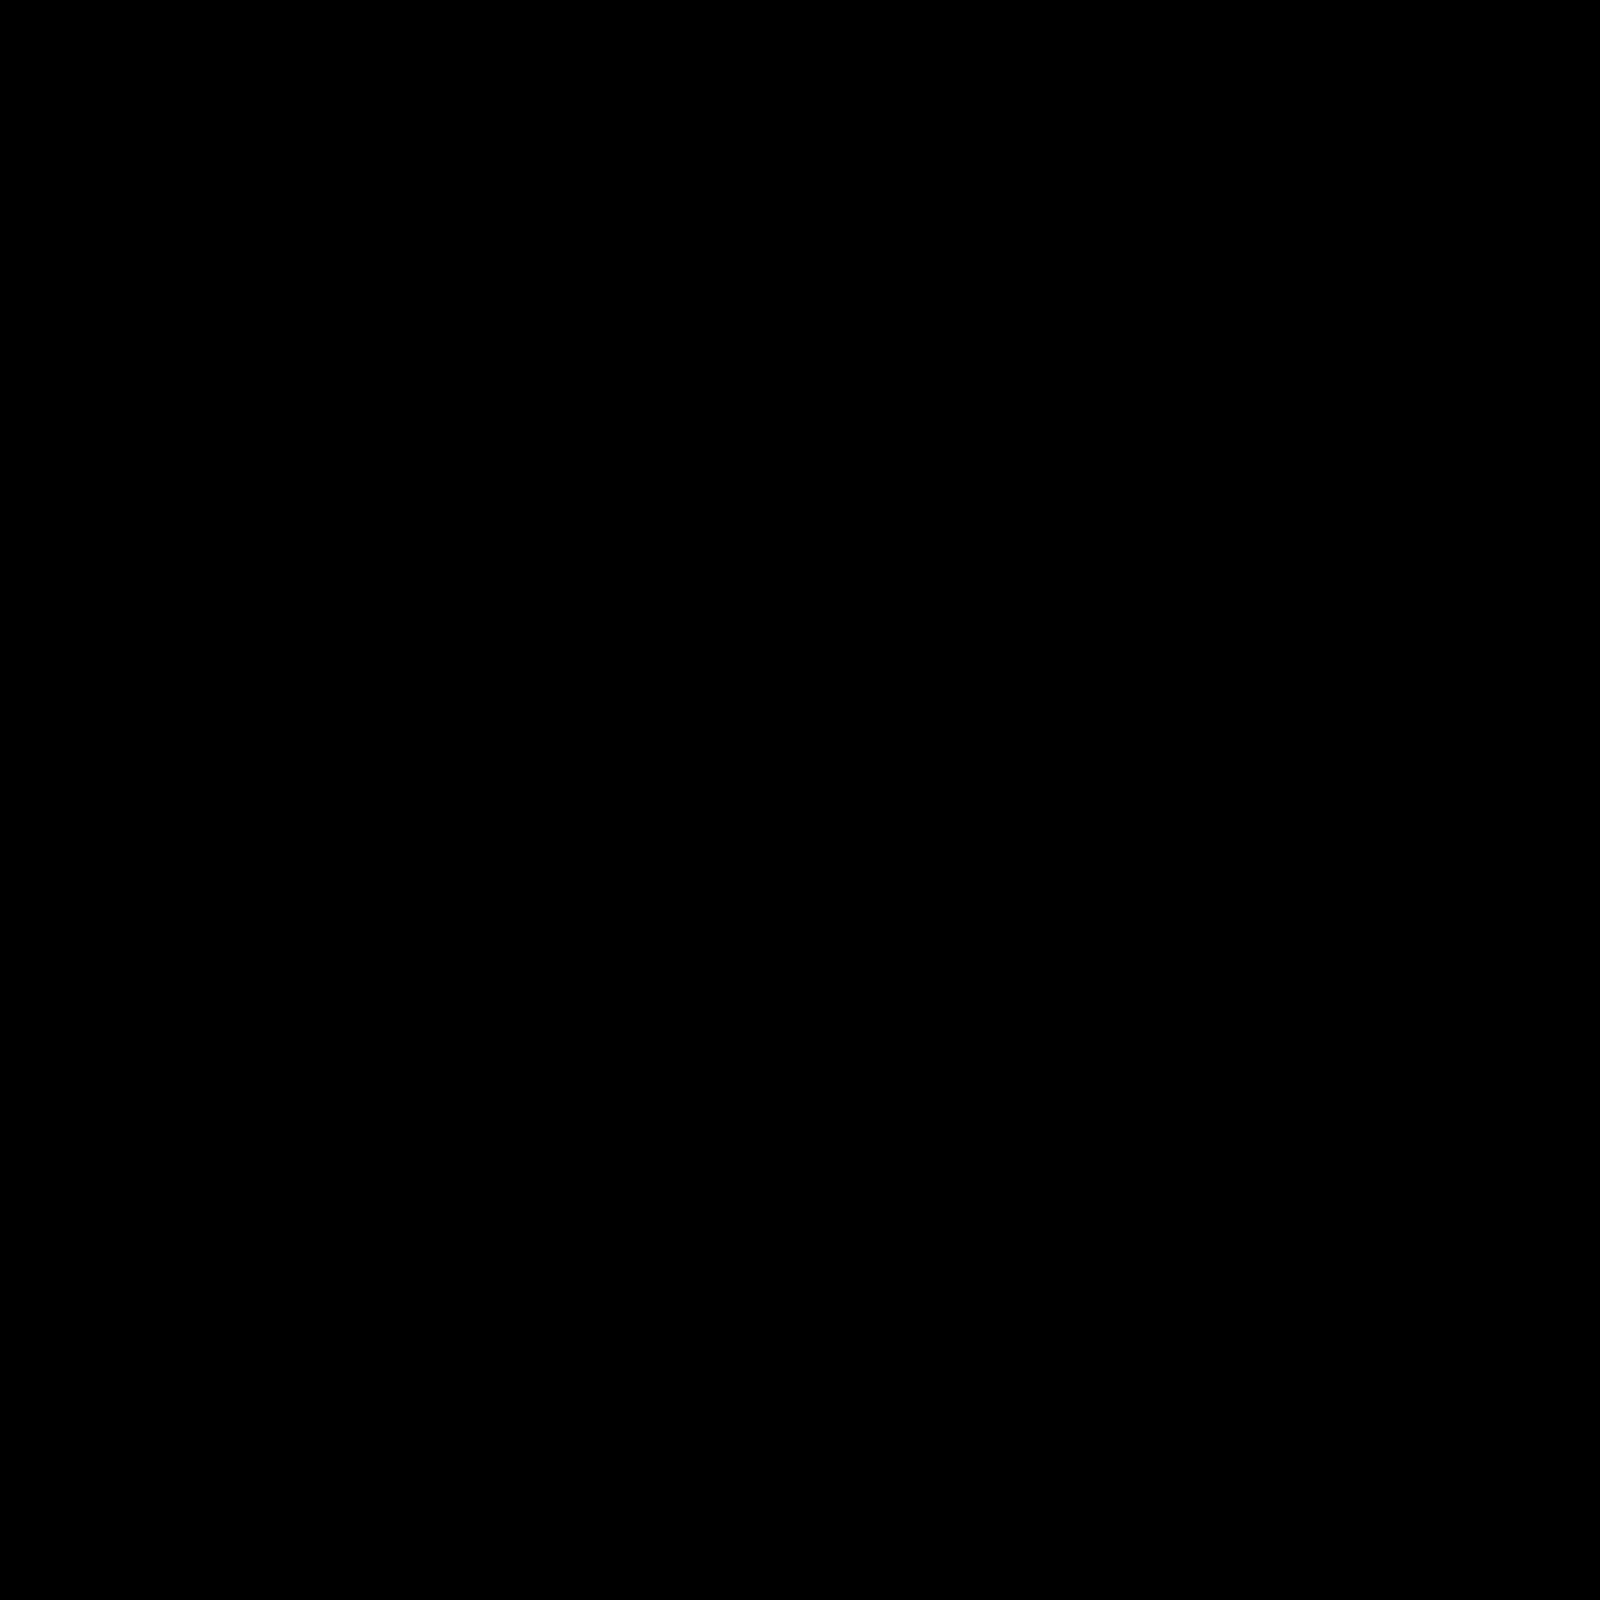 Sticker Filled icon